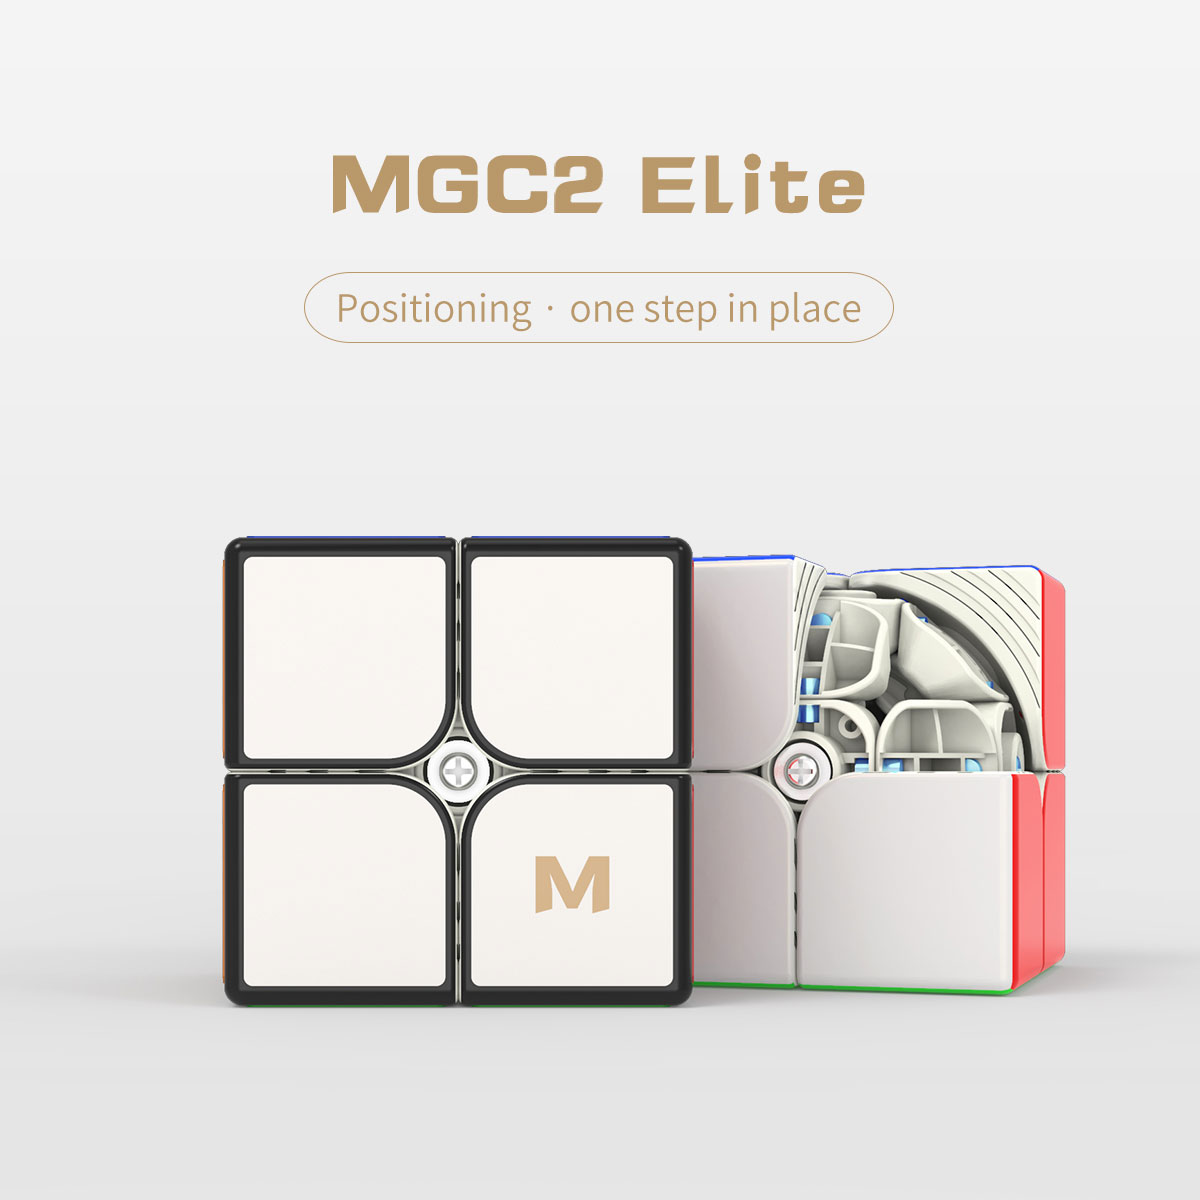 yj-mgc2-elite-2x2-introduction